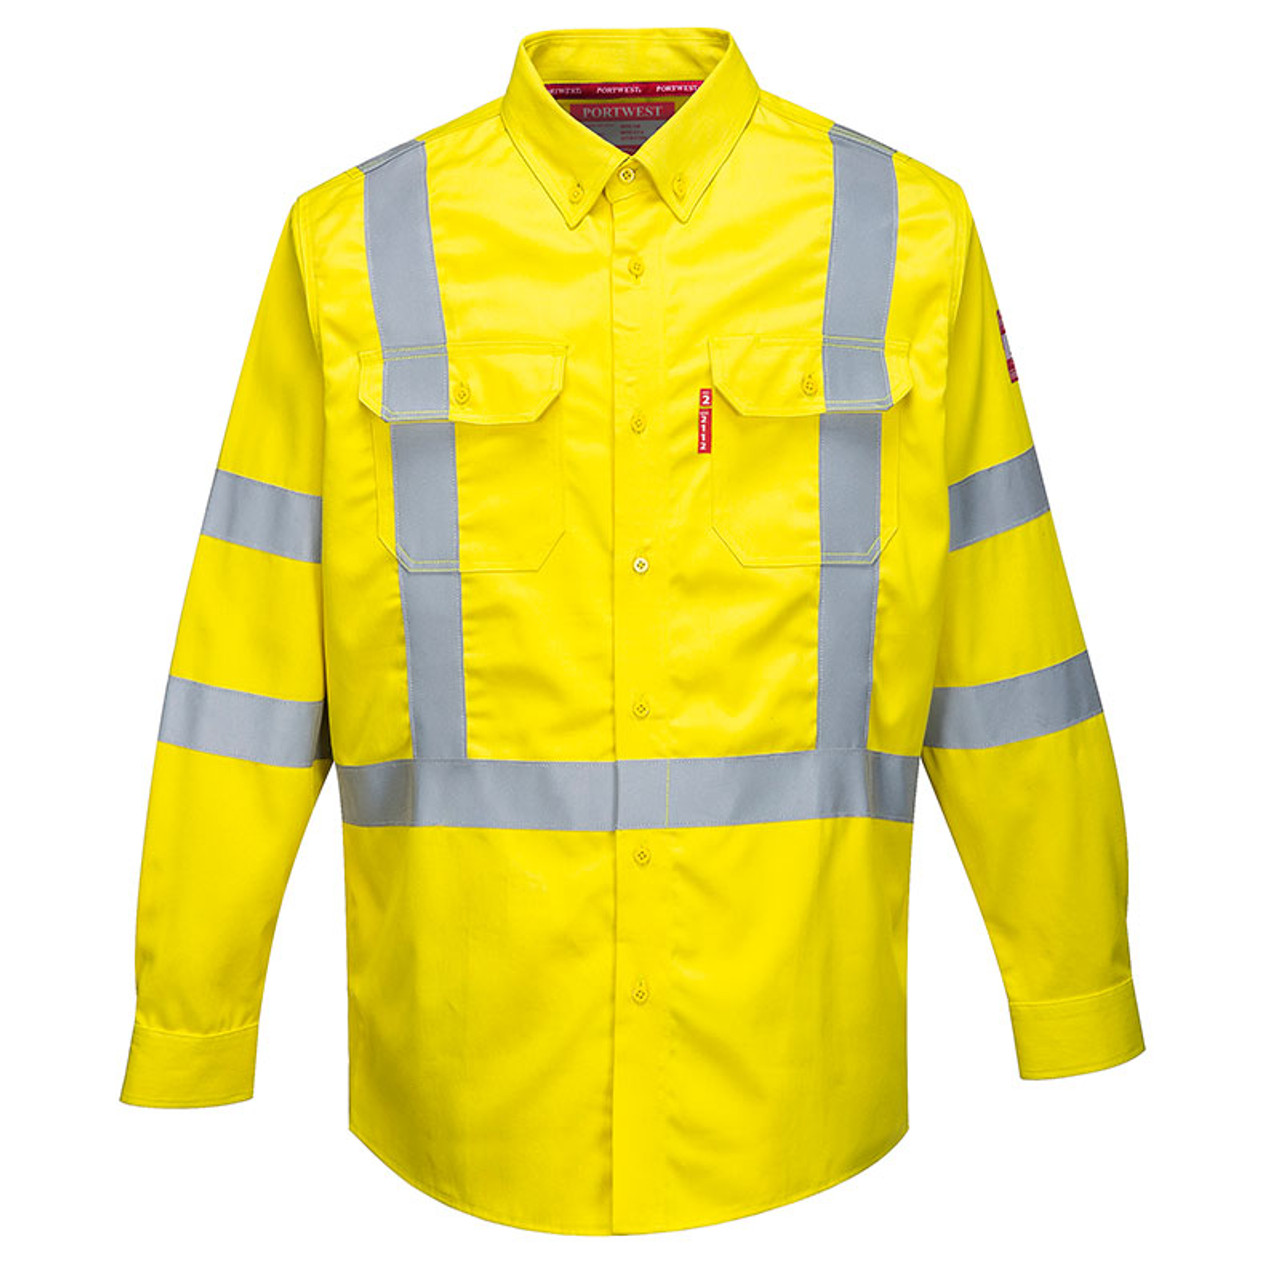 1e6fa05ed804 PortWest FR Class 3 Hi Vis Yellow Long Sleeve Shirt FR95YE Front